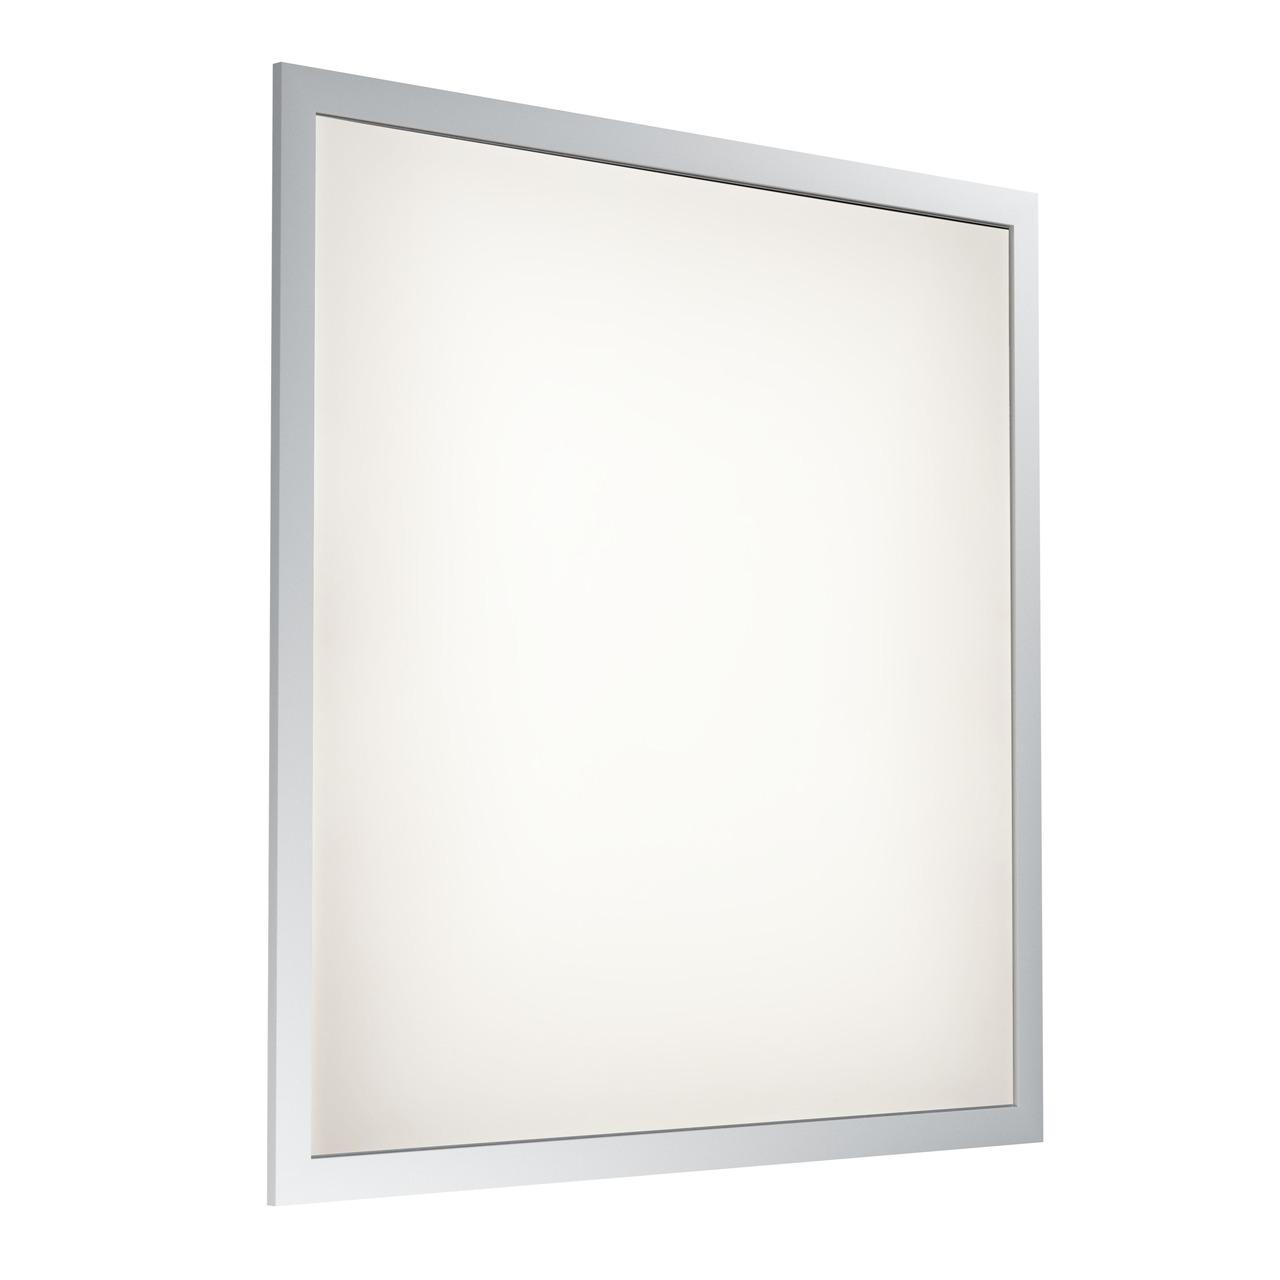 Ledvance PLANONS PLUS 30-W-LED-Aufbaupanel 60 x 60 cm- Farbtemperatur einstellbar per Fernbedienung